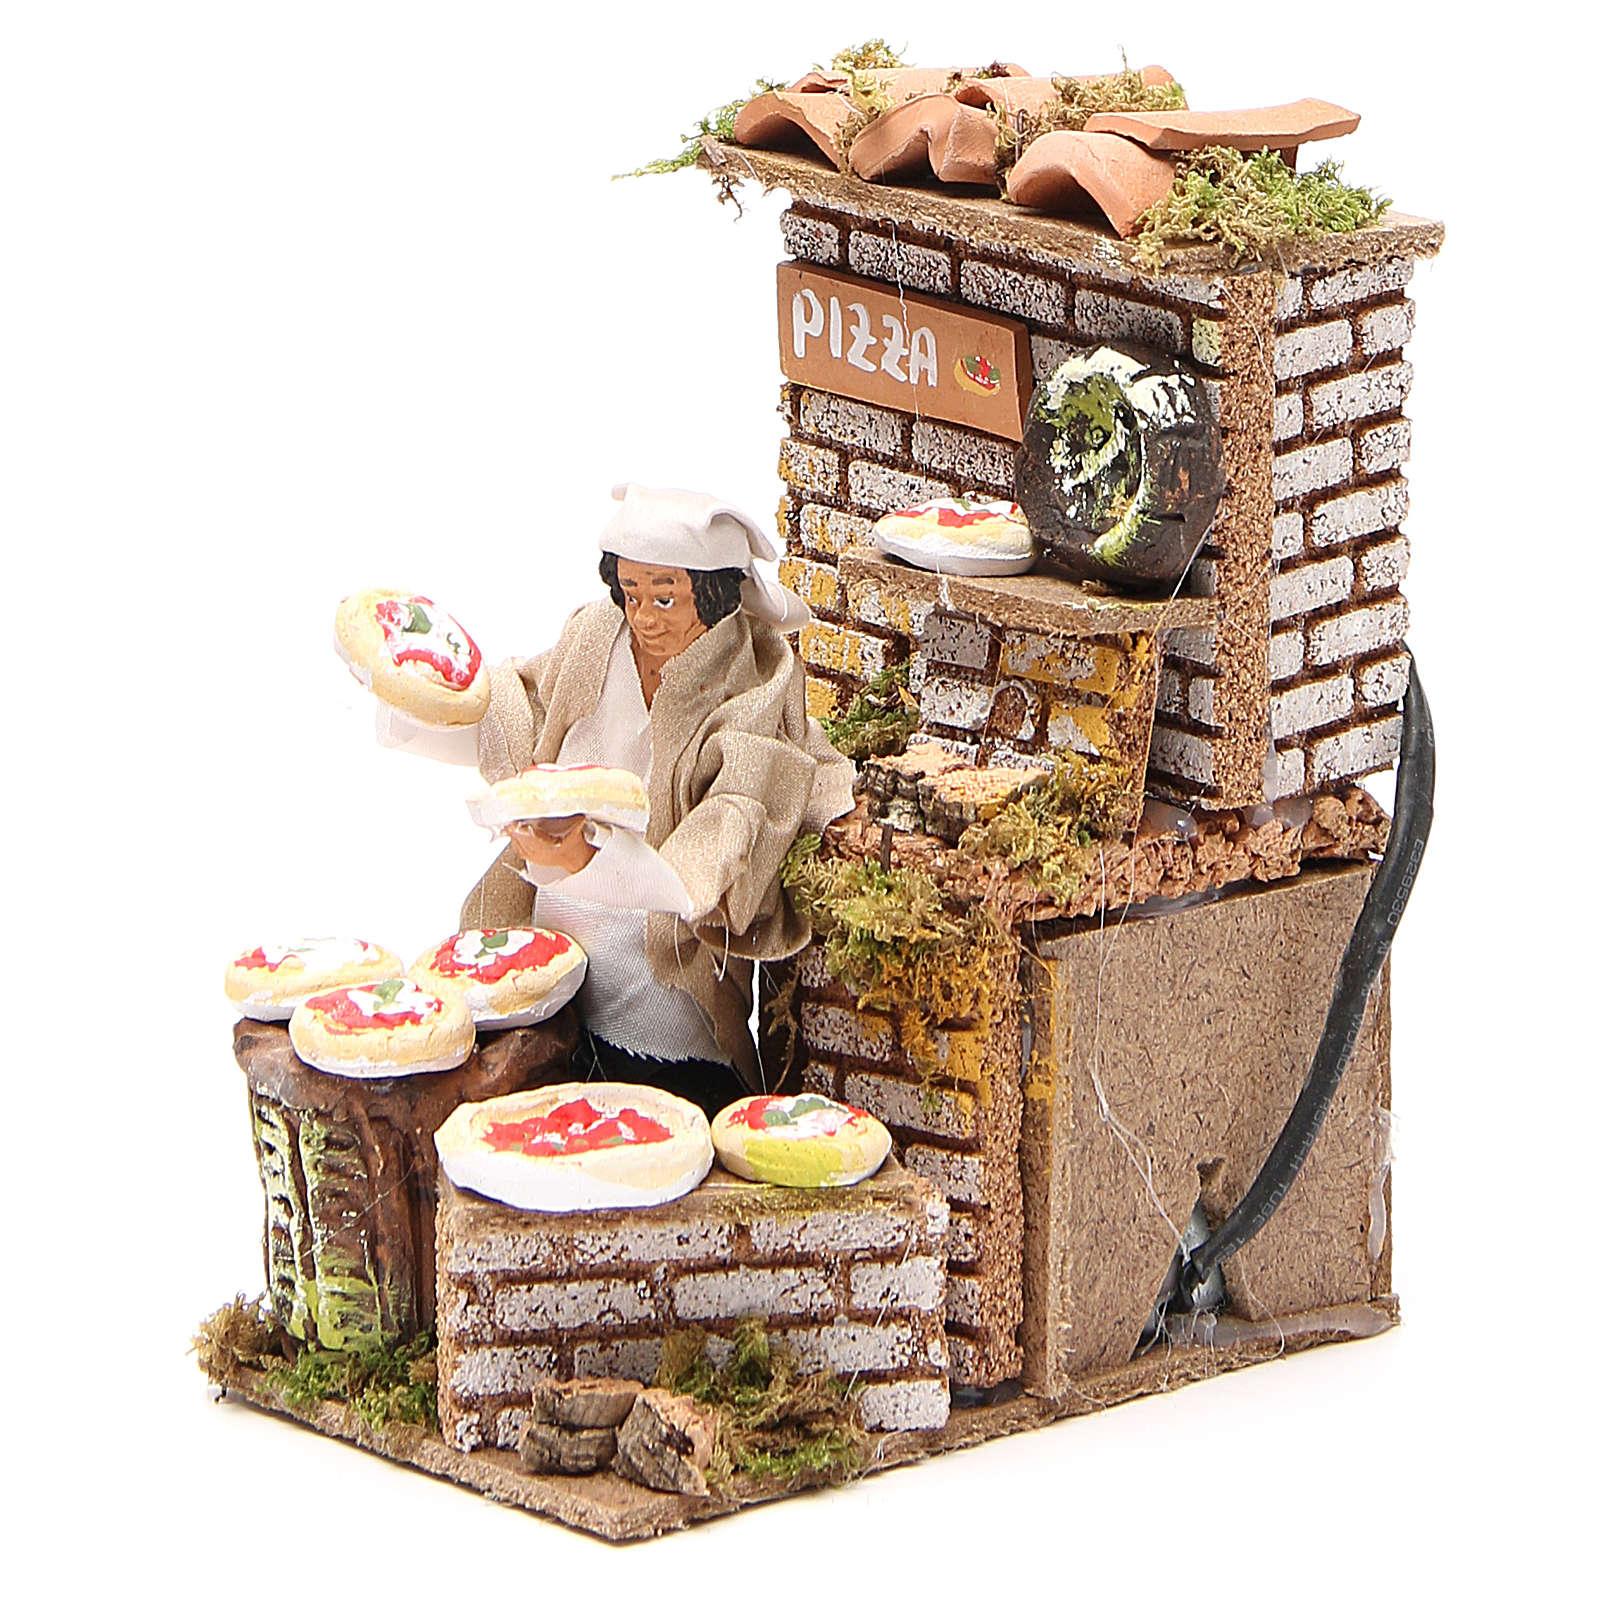 Animated nativity figurine 10cm pizza stall 3